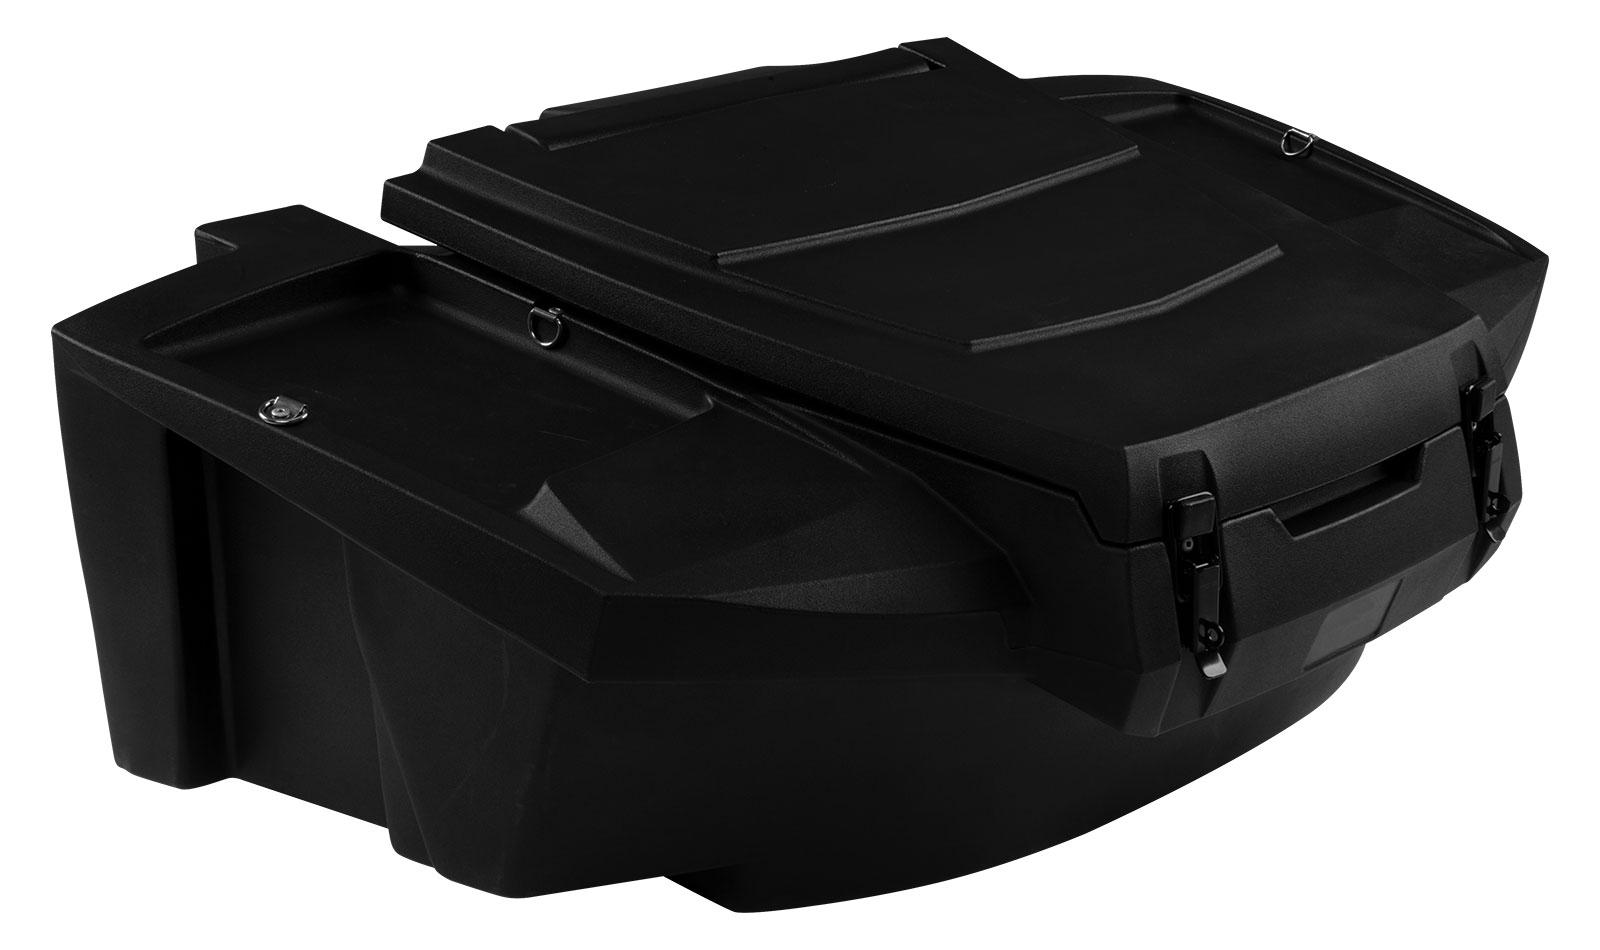 QuadBoss Journey Cargo Box